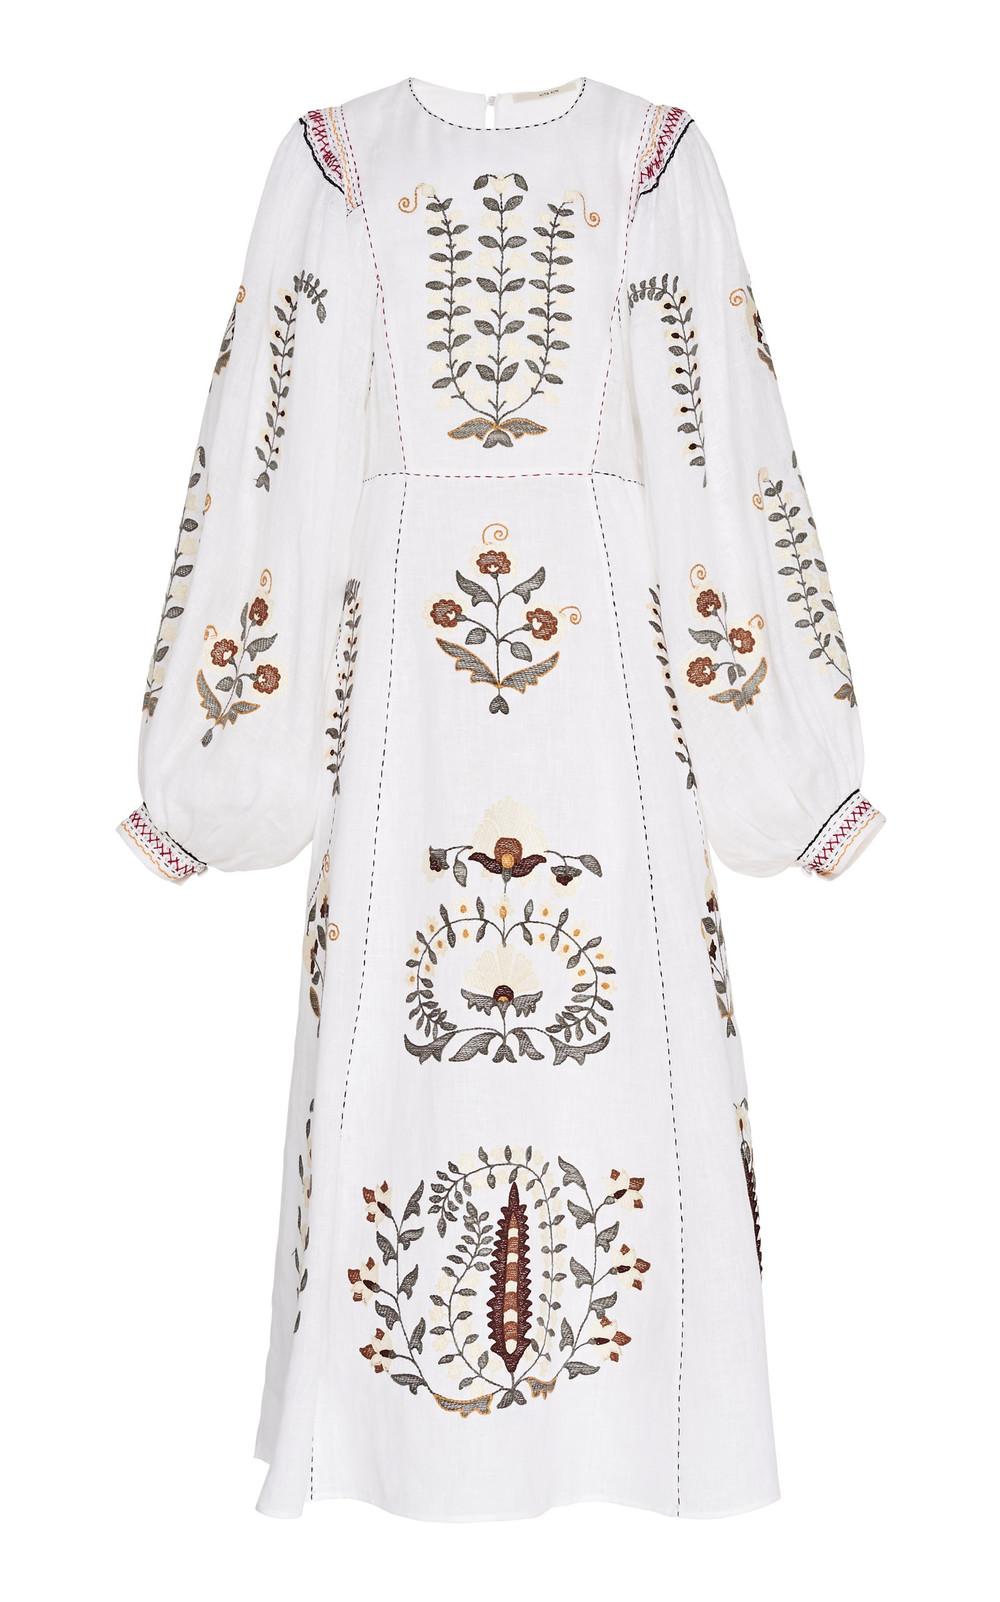 Vita Kin Patchouli Appliquéd Embroidered Linen Midi Dress Size: XS in white